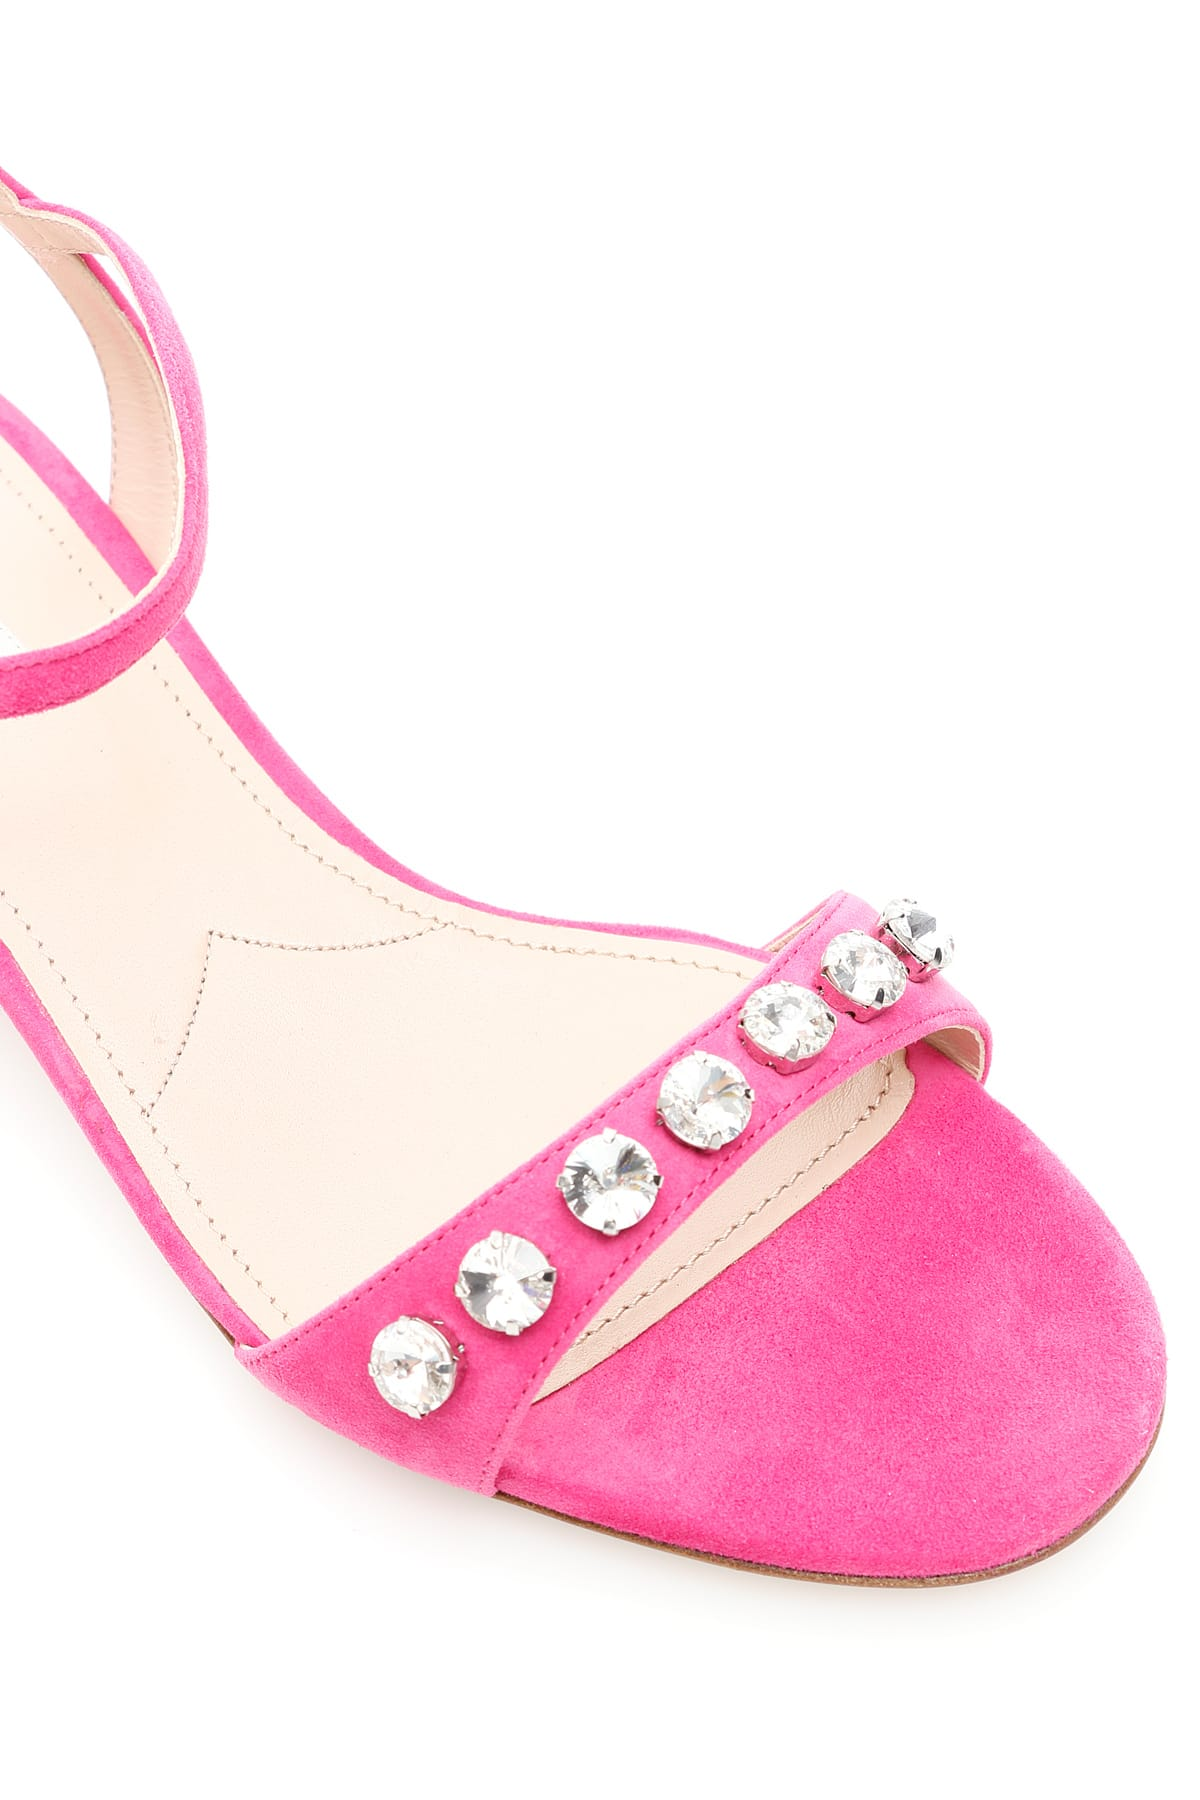 Best Price Miu Crystal Sandals - Great Deals